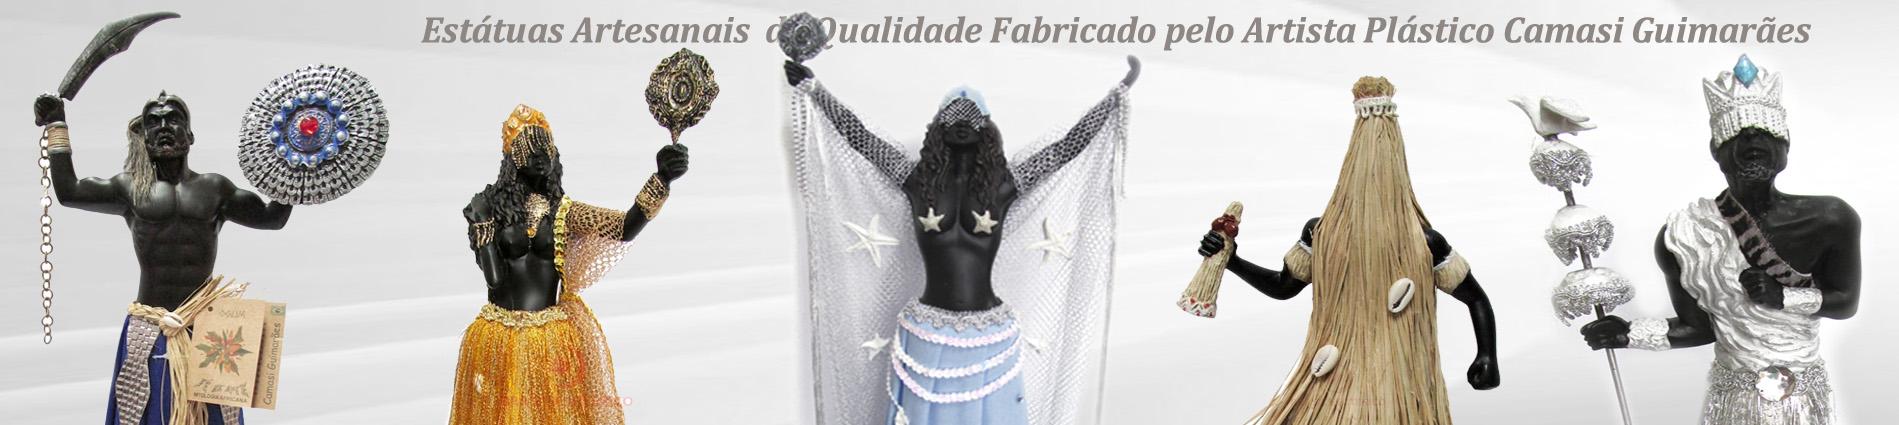 https://cdn.brasilesoterico.com/imagens_banners/09261d2b94384cd810b6c63dd46fab6c.jpg